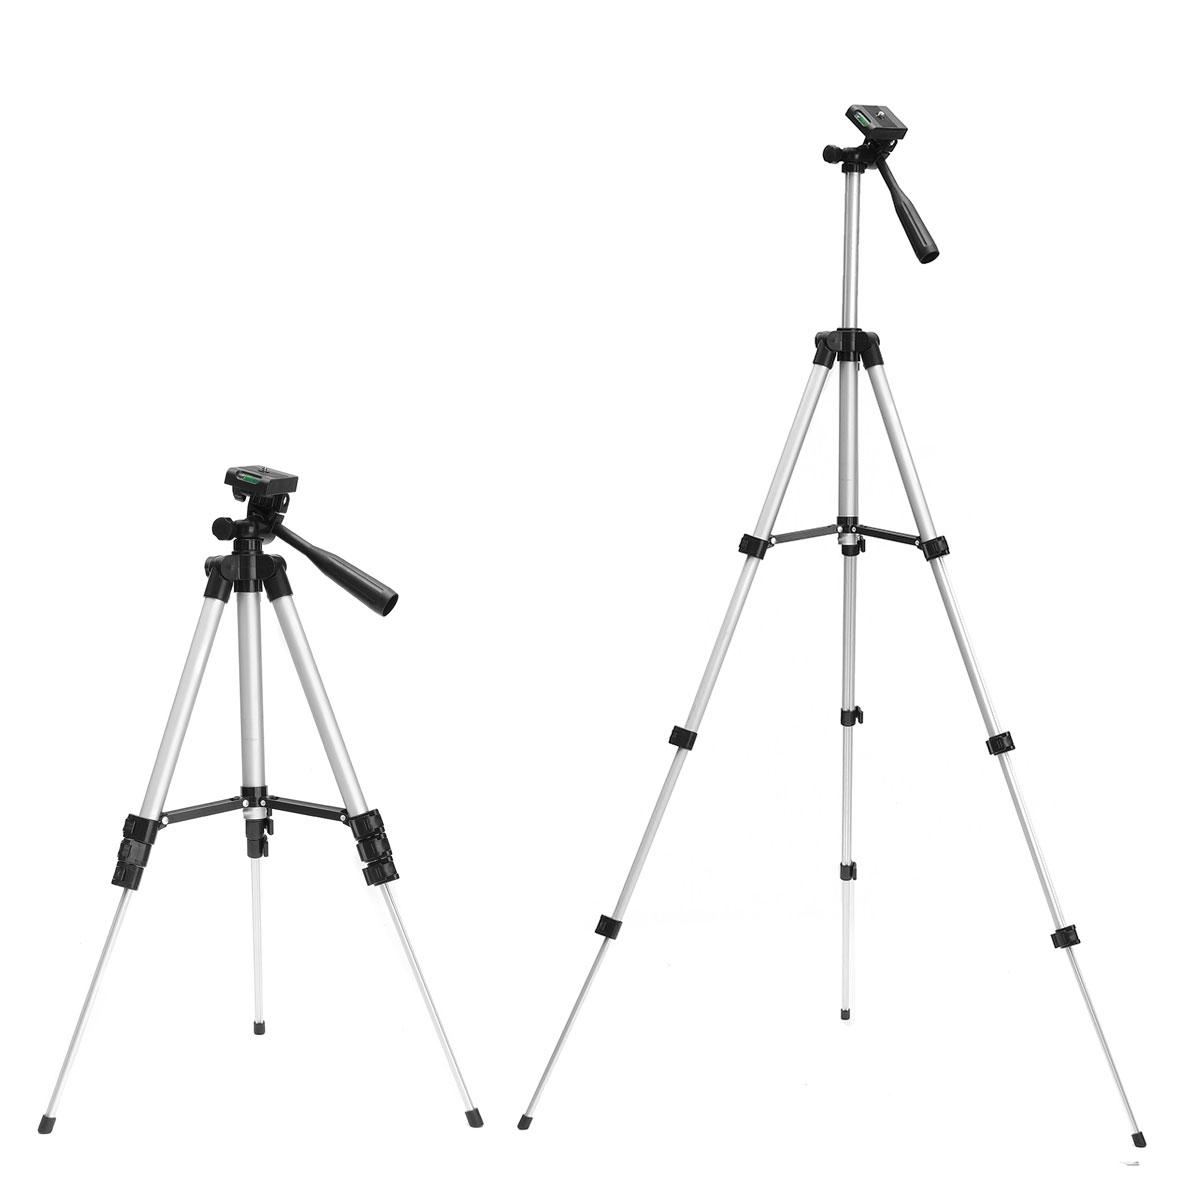 Adjustable Tripod Camera For Iphone Samsung Stand Holder